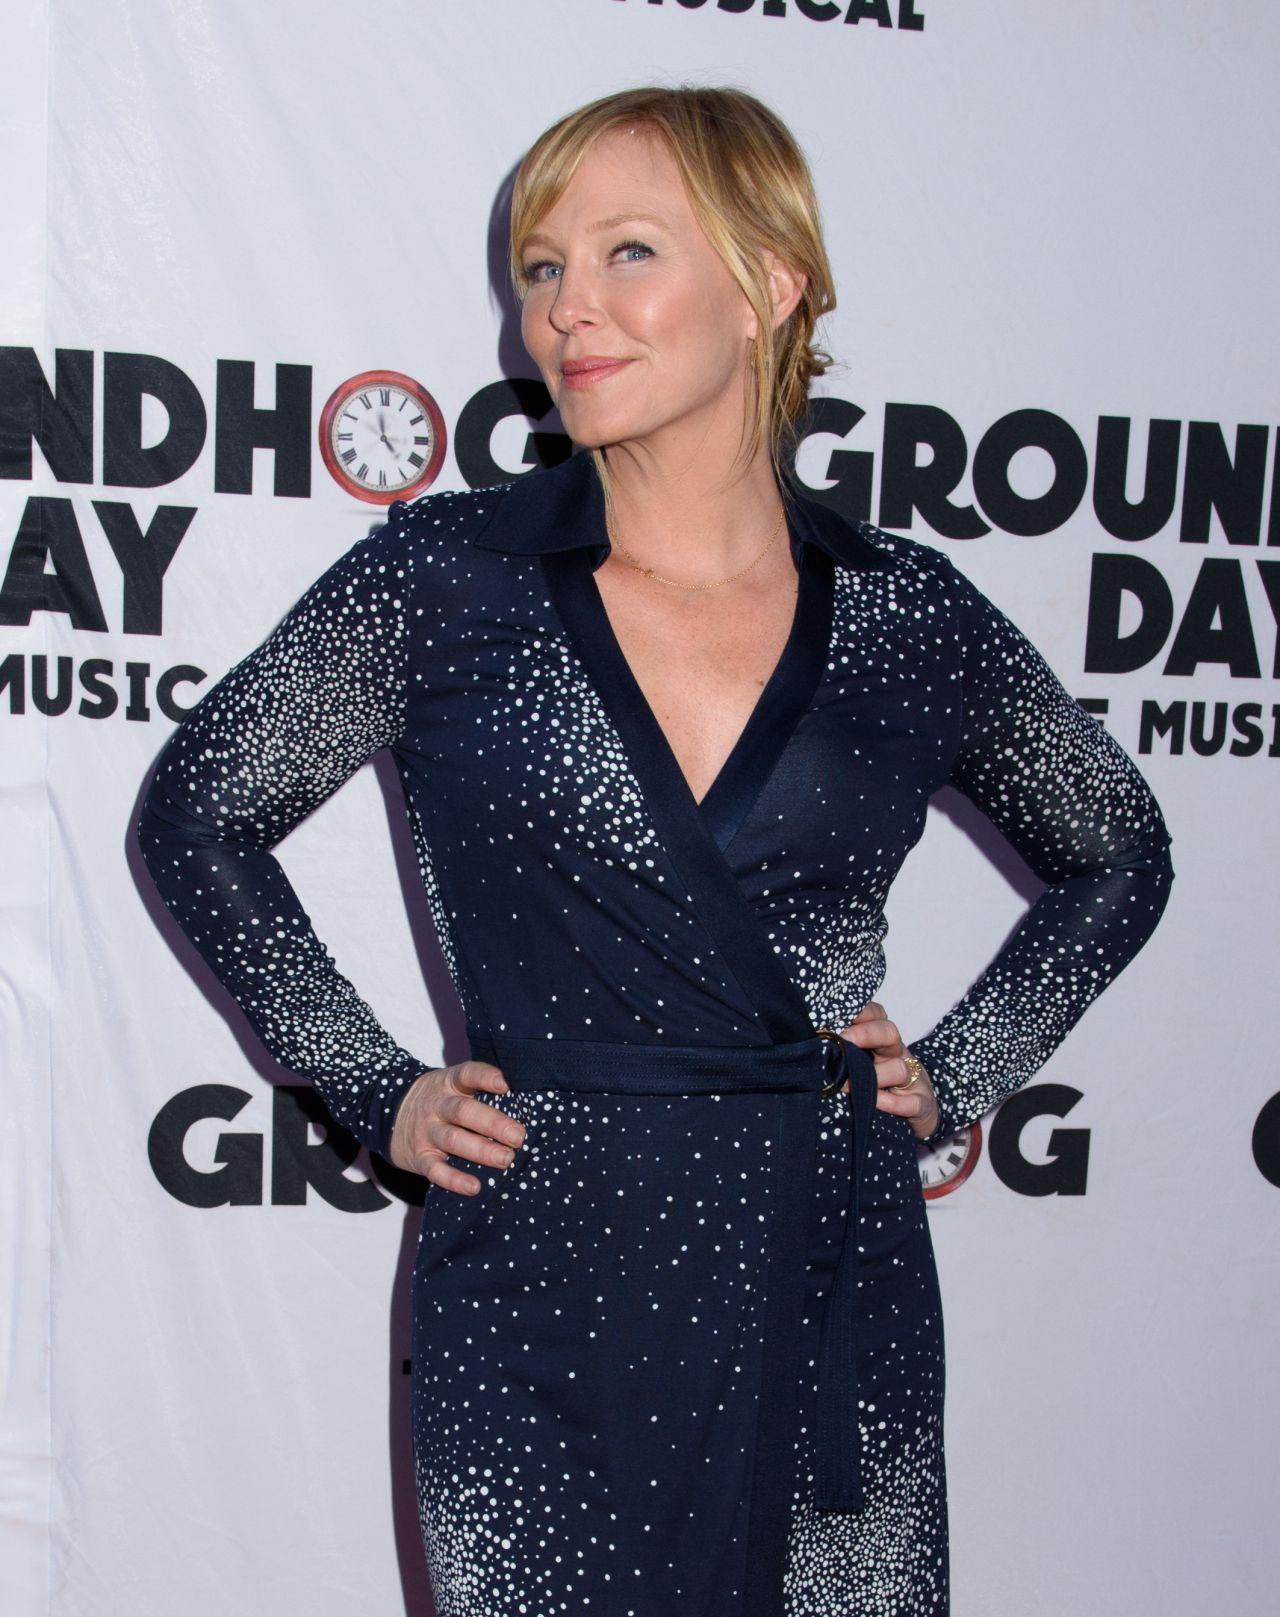 Kelli Giddish Groundhog Day The Musical In New York 4